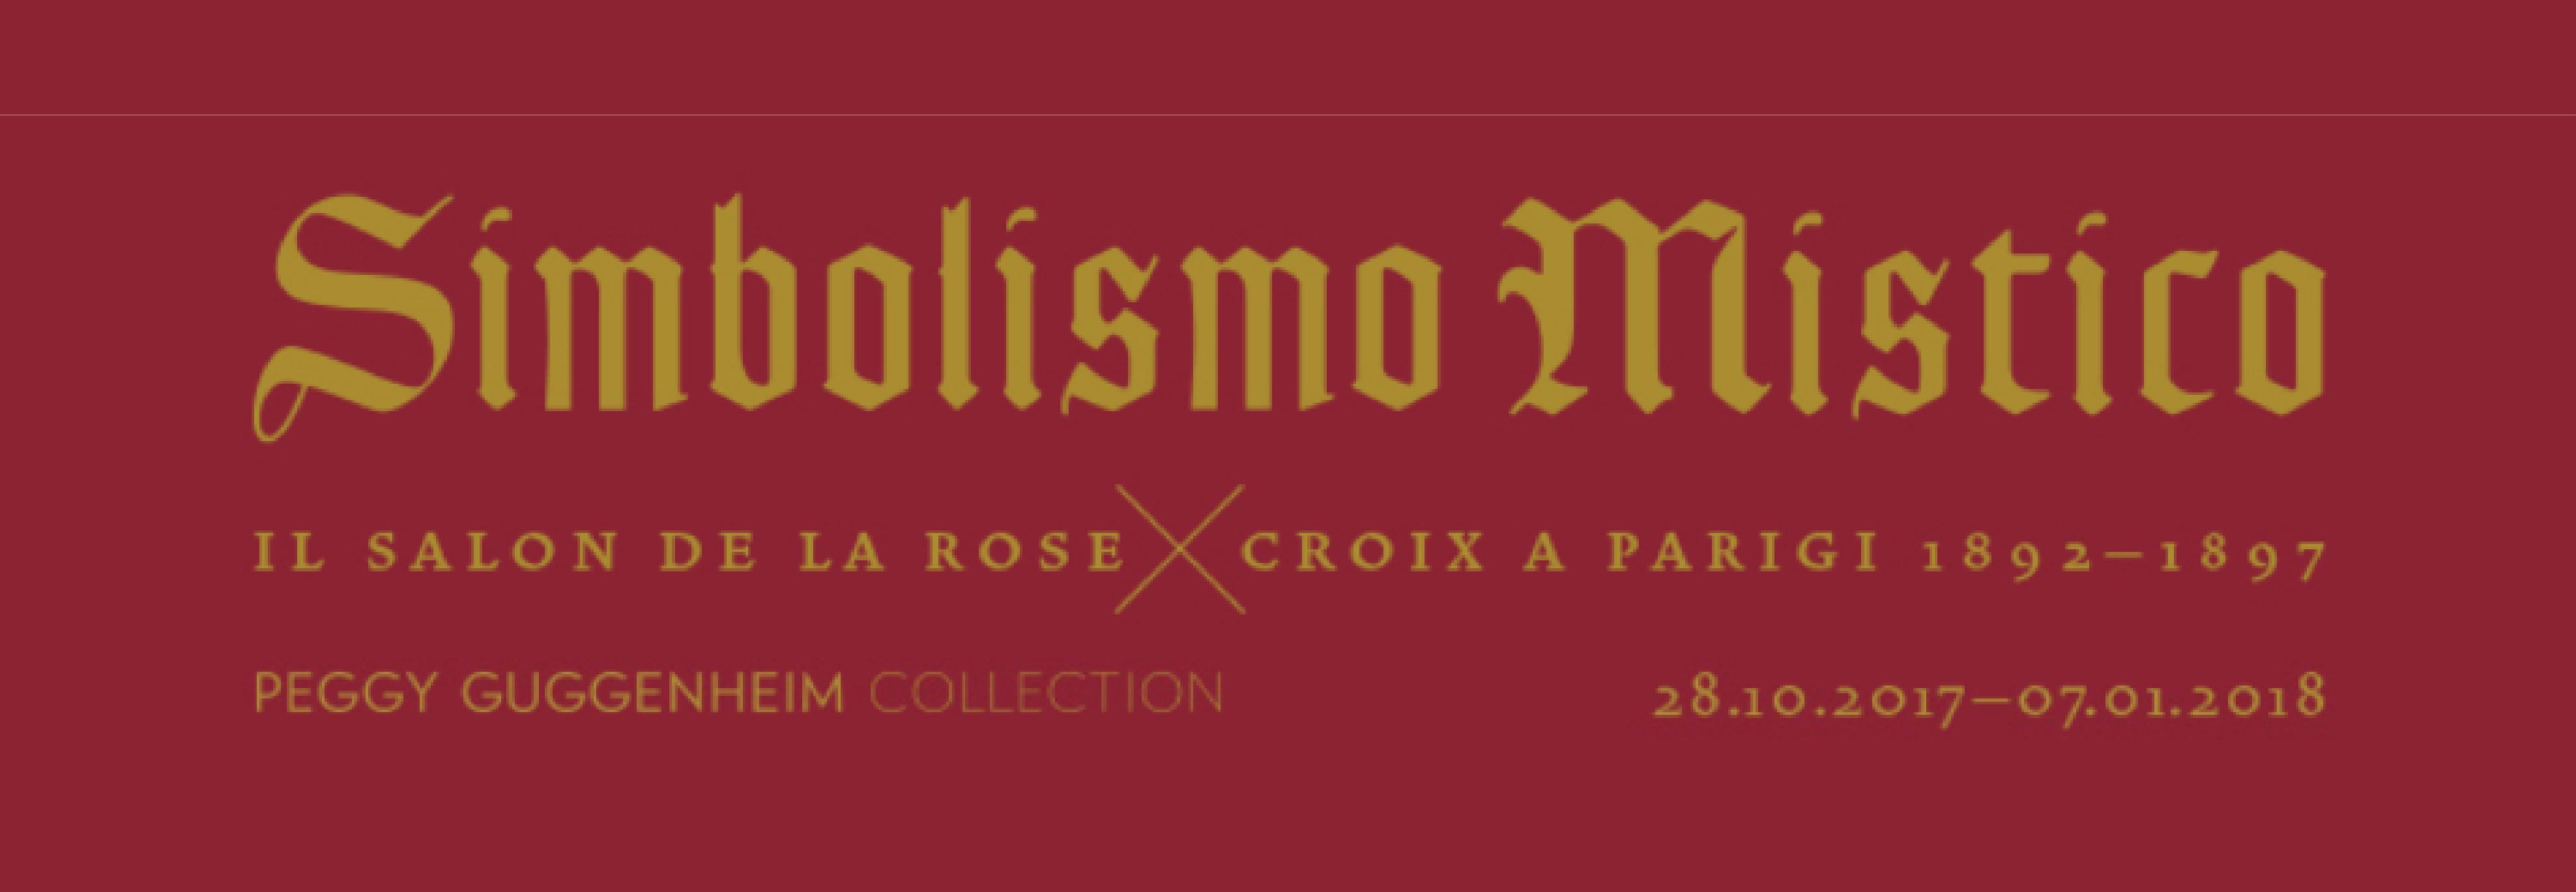 simbolismo-mistico-il-salon-de-la-rosecroix-a-parigi-1892-1897-01